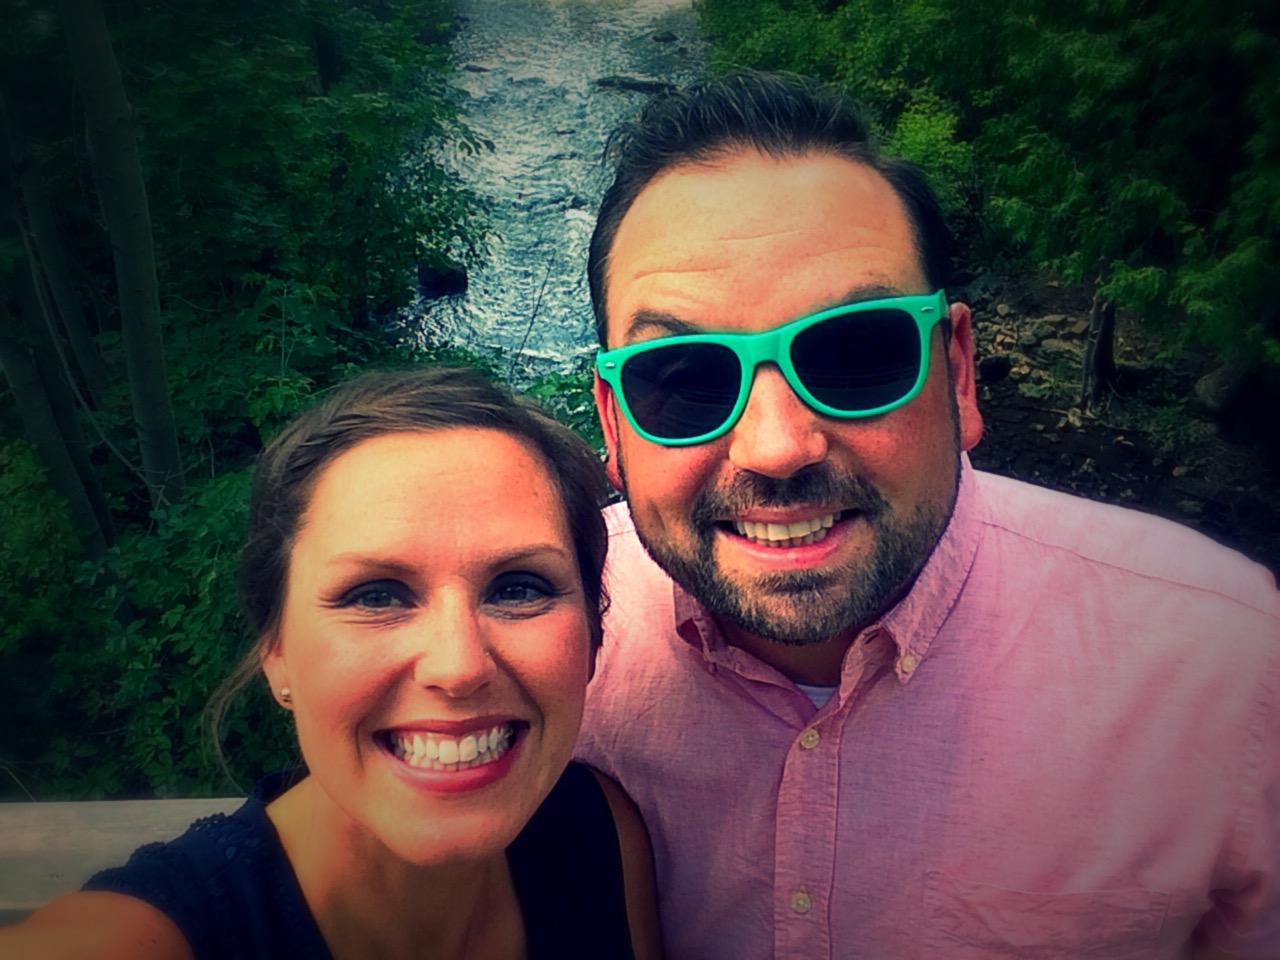 Jeff and Tara